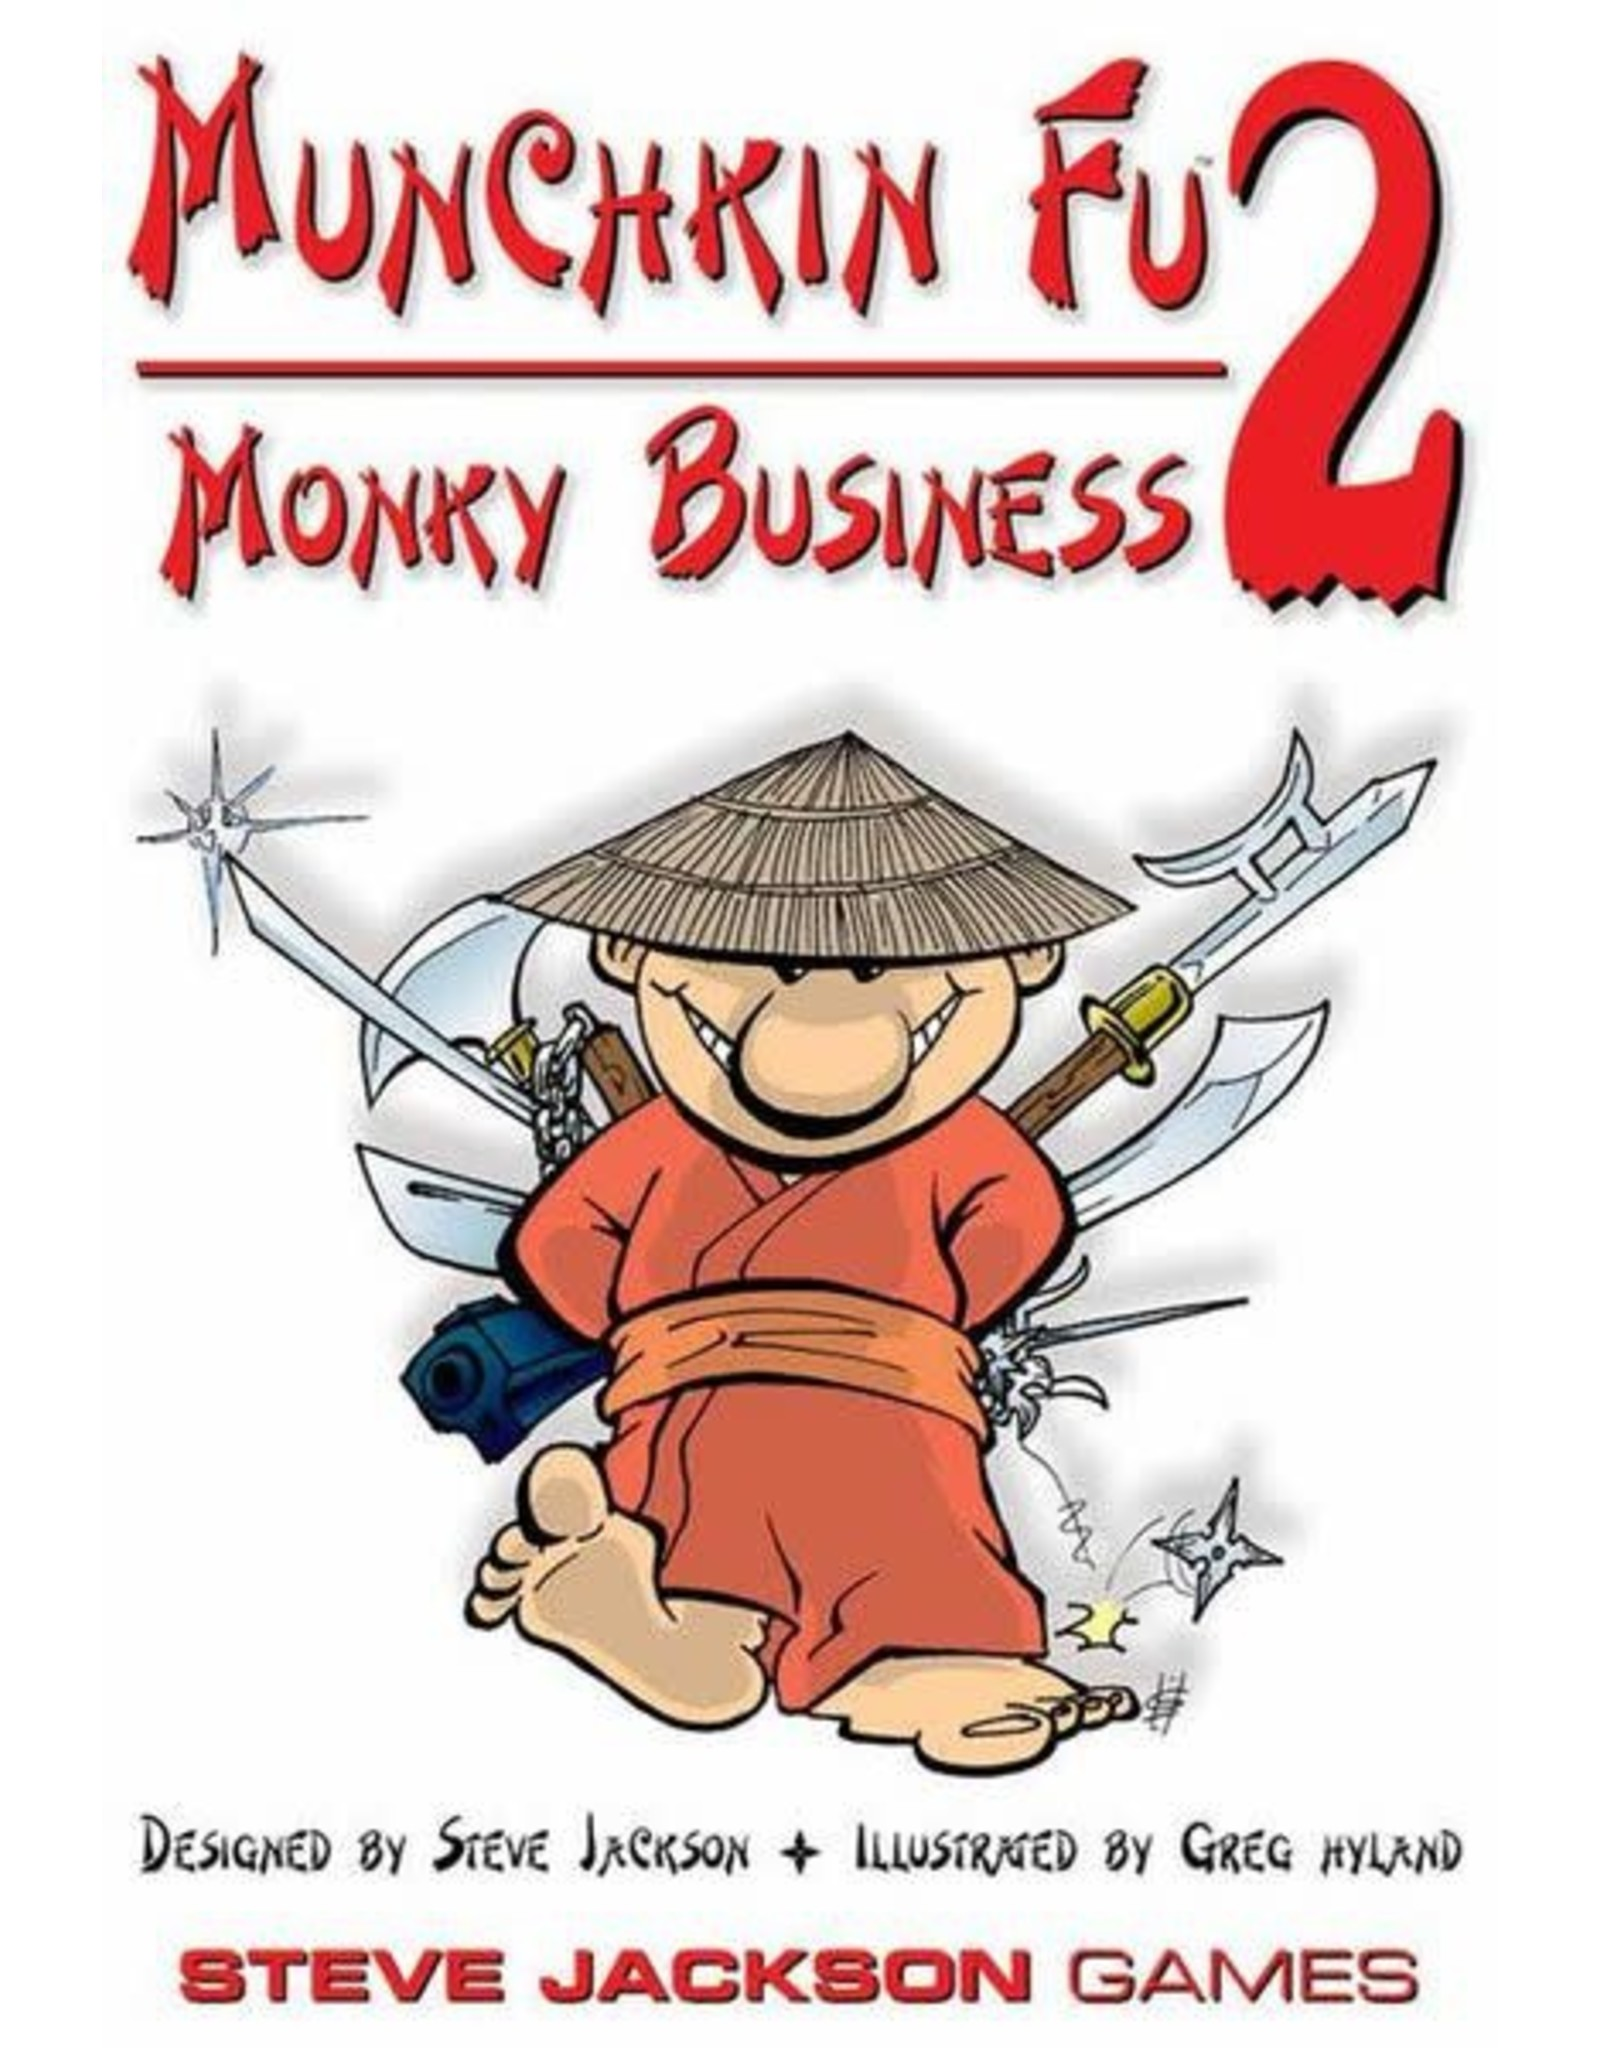 Steve Jackson Games Munchkin-Fu: Monkey Business Expansion